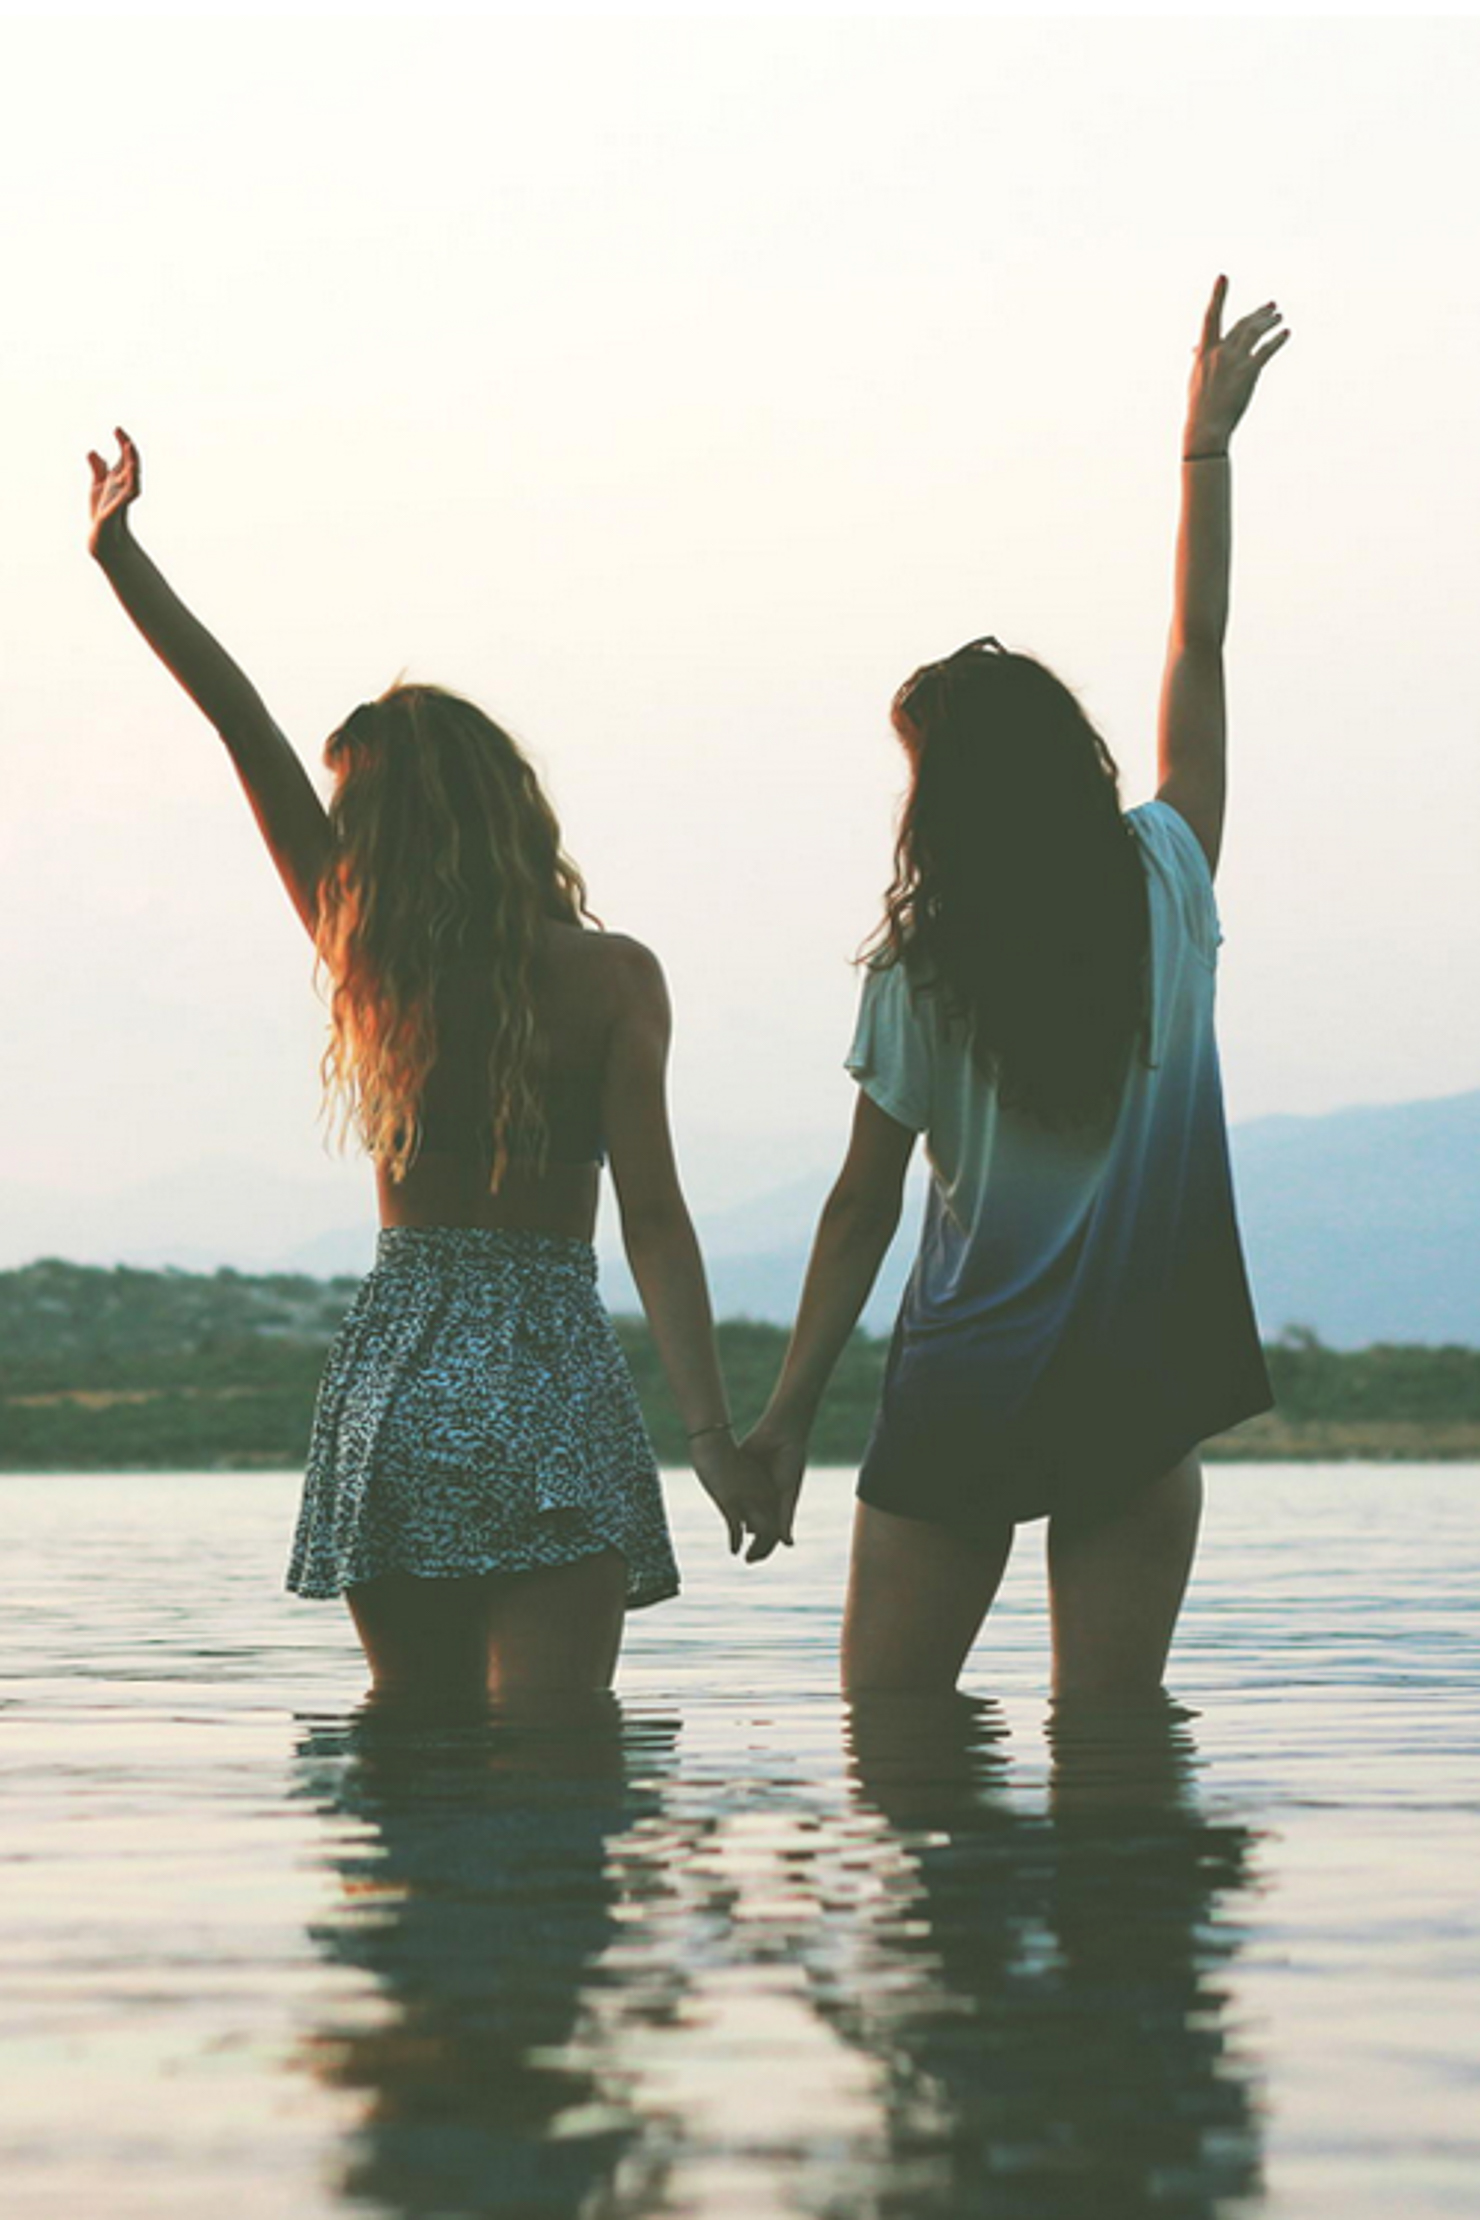 Best Friend Photography Ideas  Fotors Blog